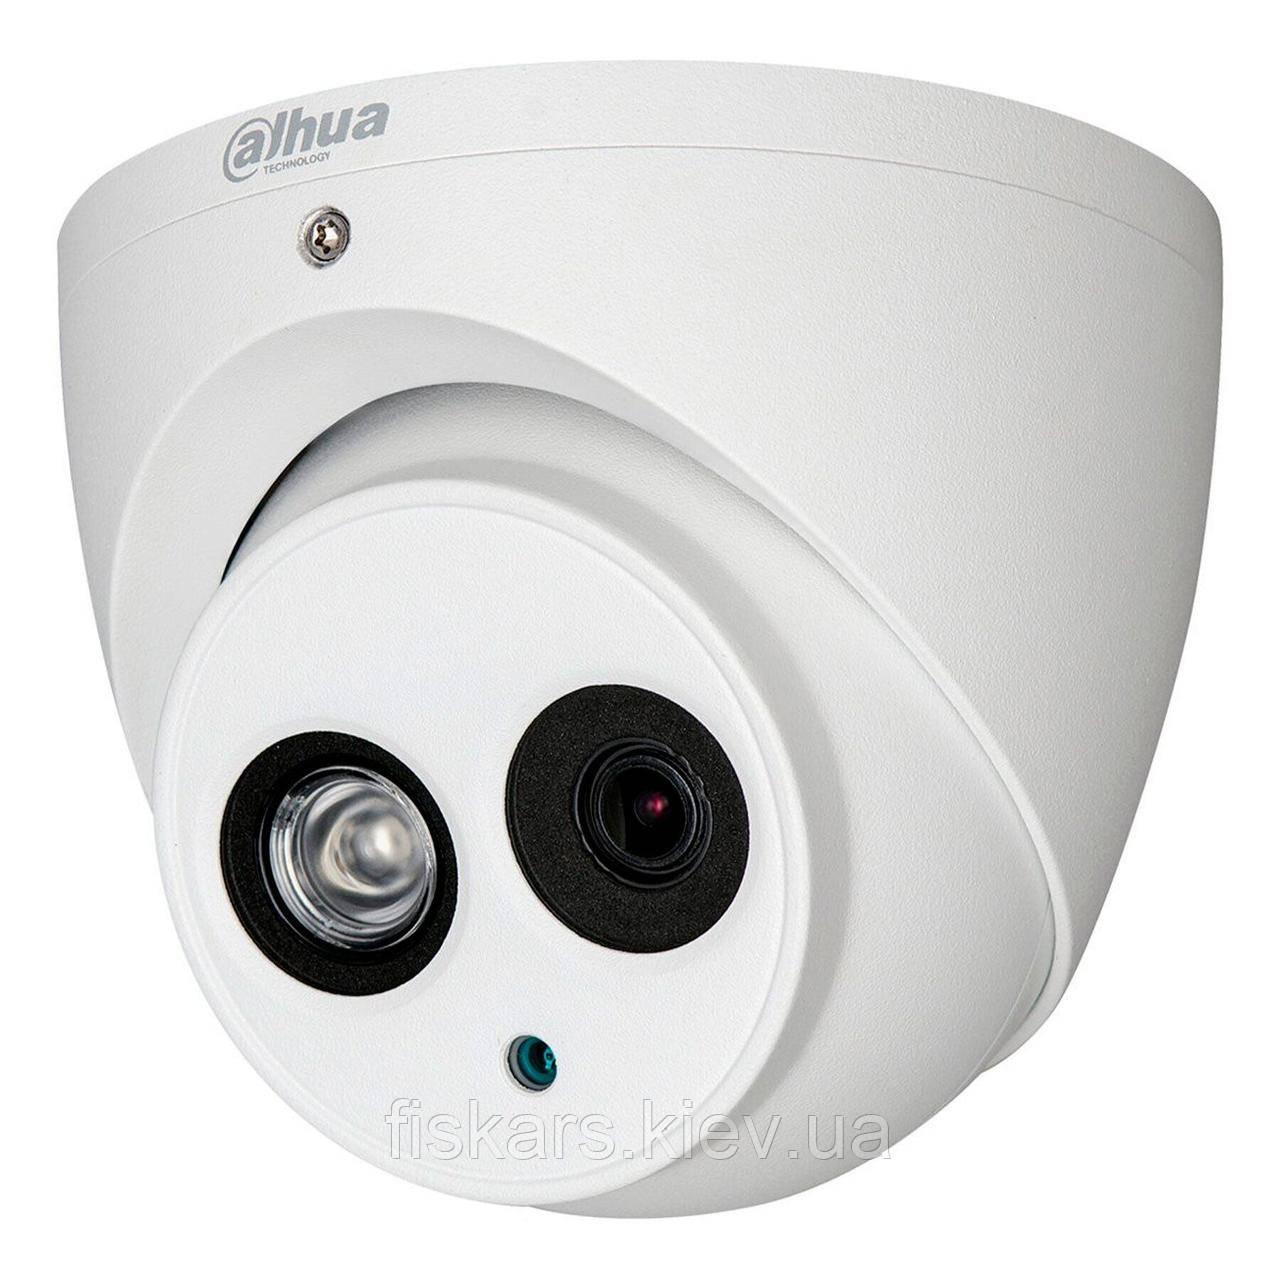 HD-CVI видеокамера Dahua DH-HAC-HDW1500EMP-A